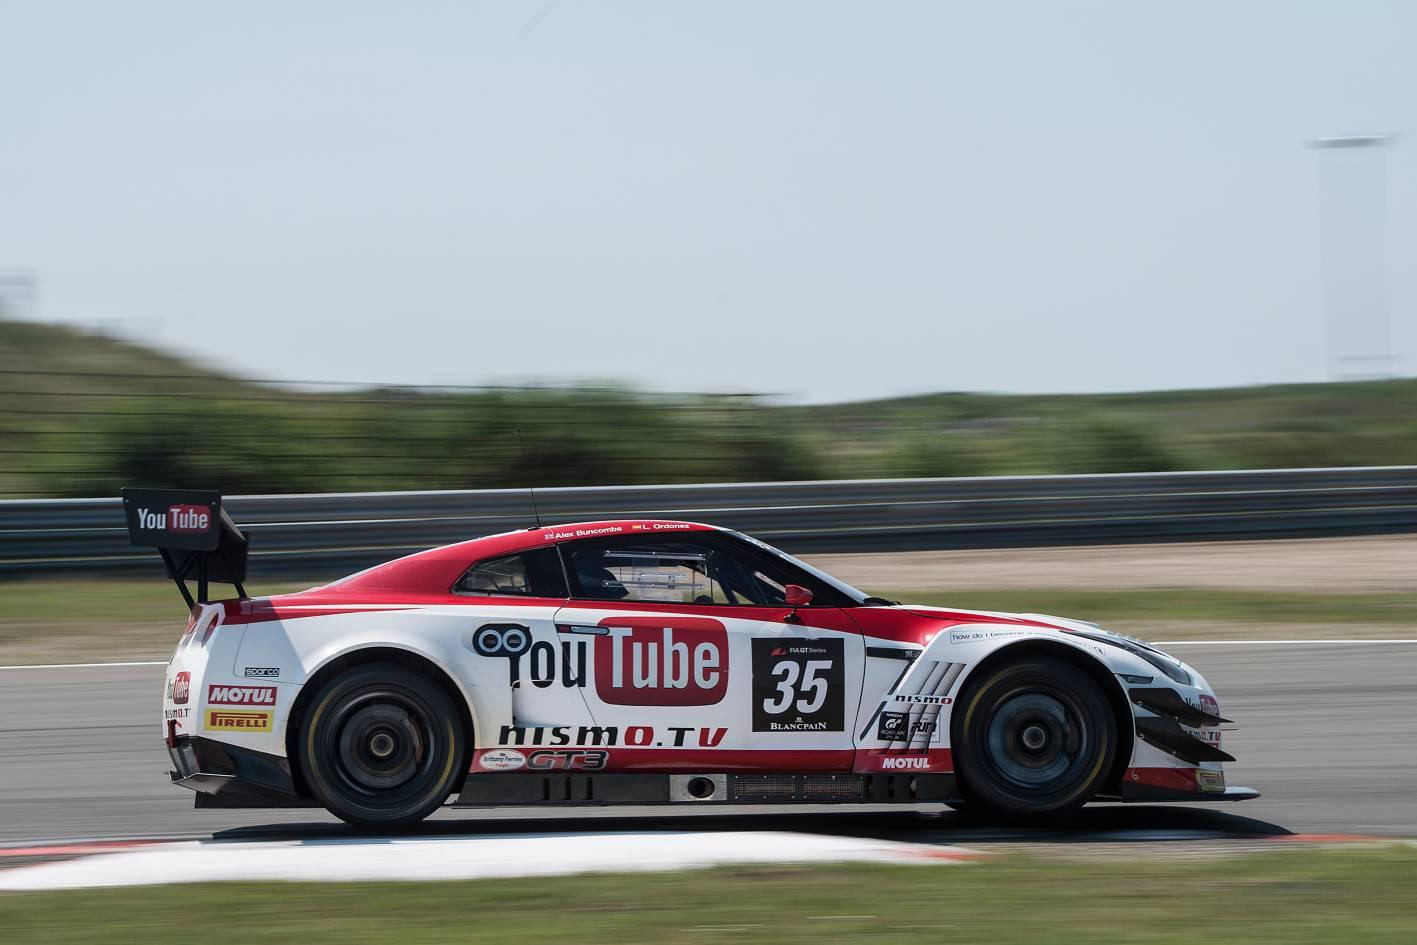 Nismo Nissan Gt R Gt3 Heading To 2014 Bathurst 12 Hour